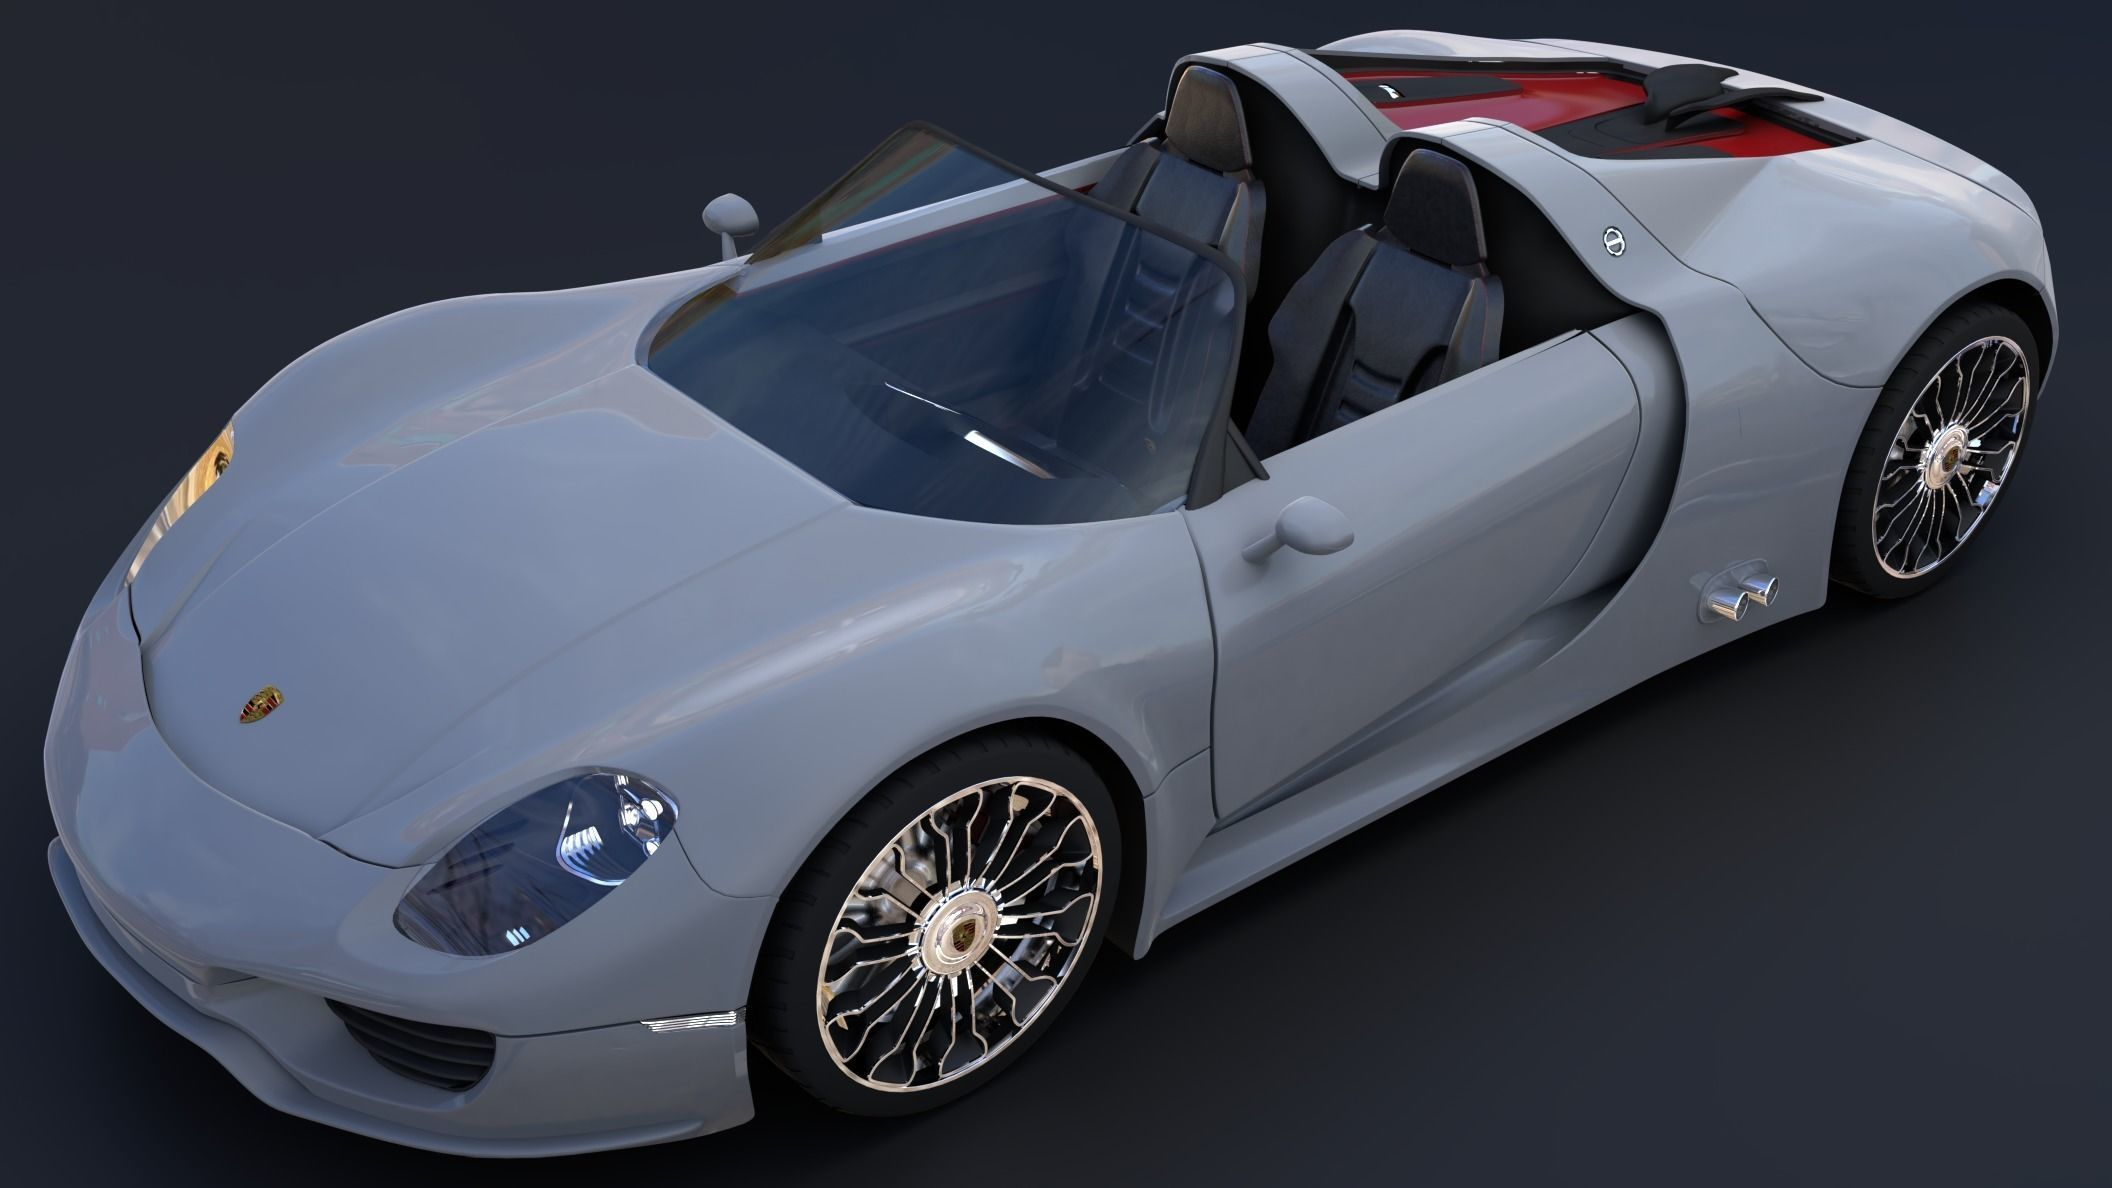 Porsche 918 Spyder Model Obj Mtl S Blend Dae Abc